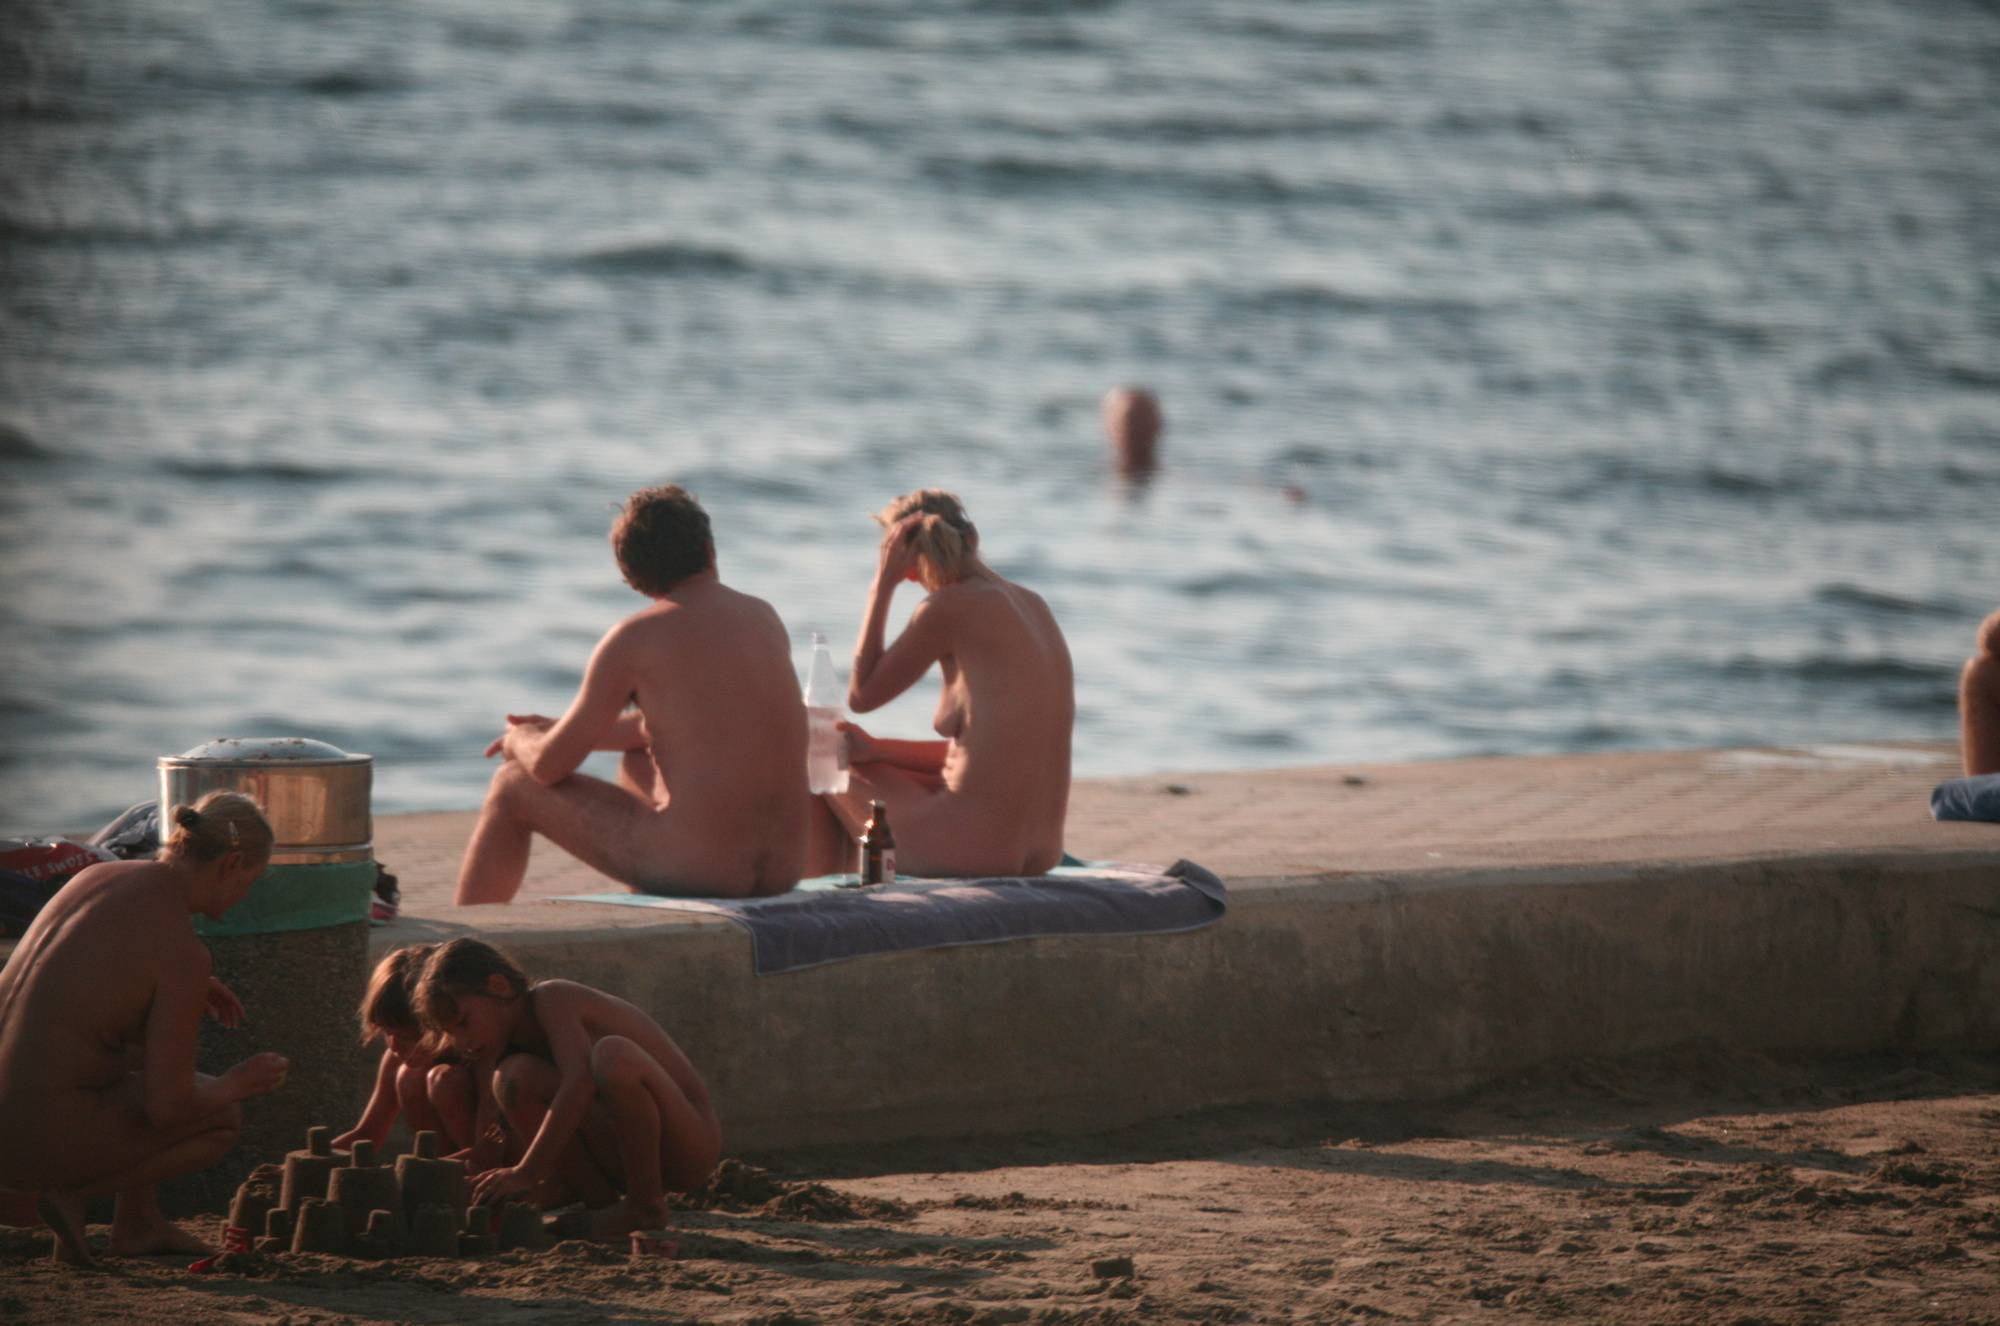 Bares Naturist Beach Slab - 1